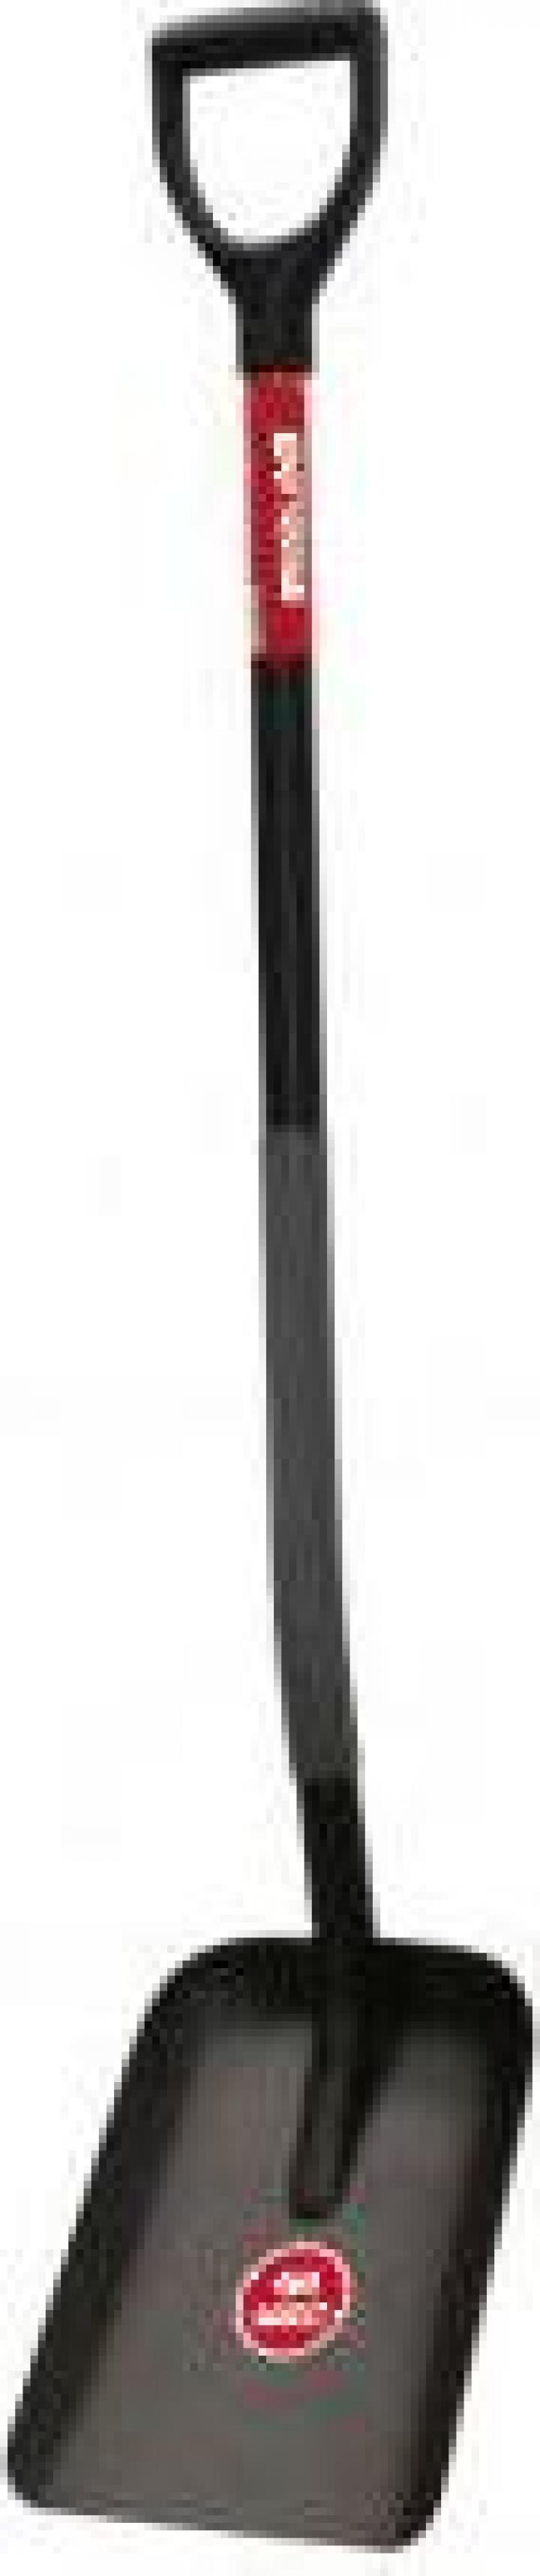 Lopata cu maner metal DY 230x320/1250mm